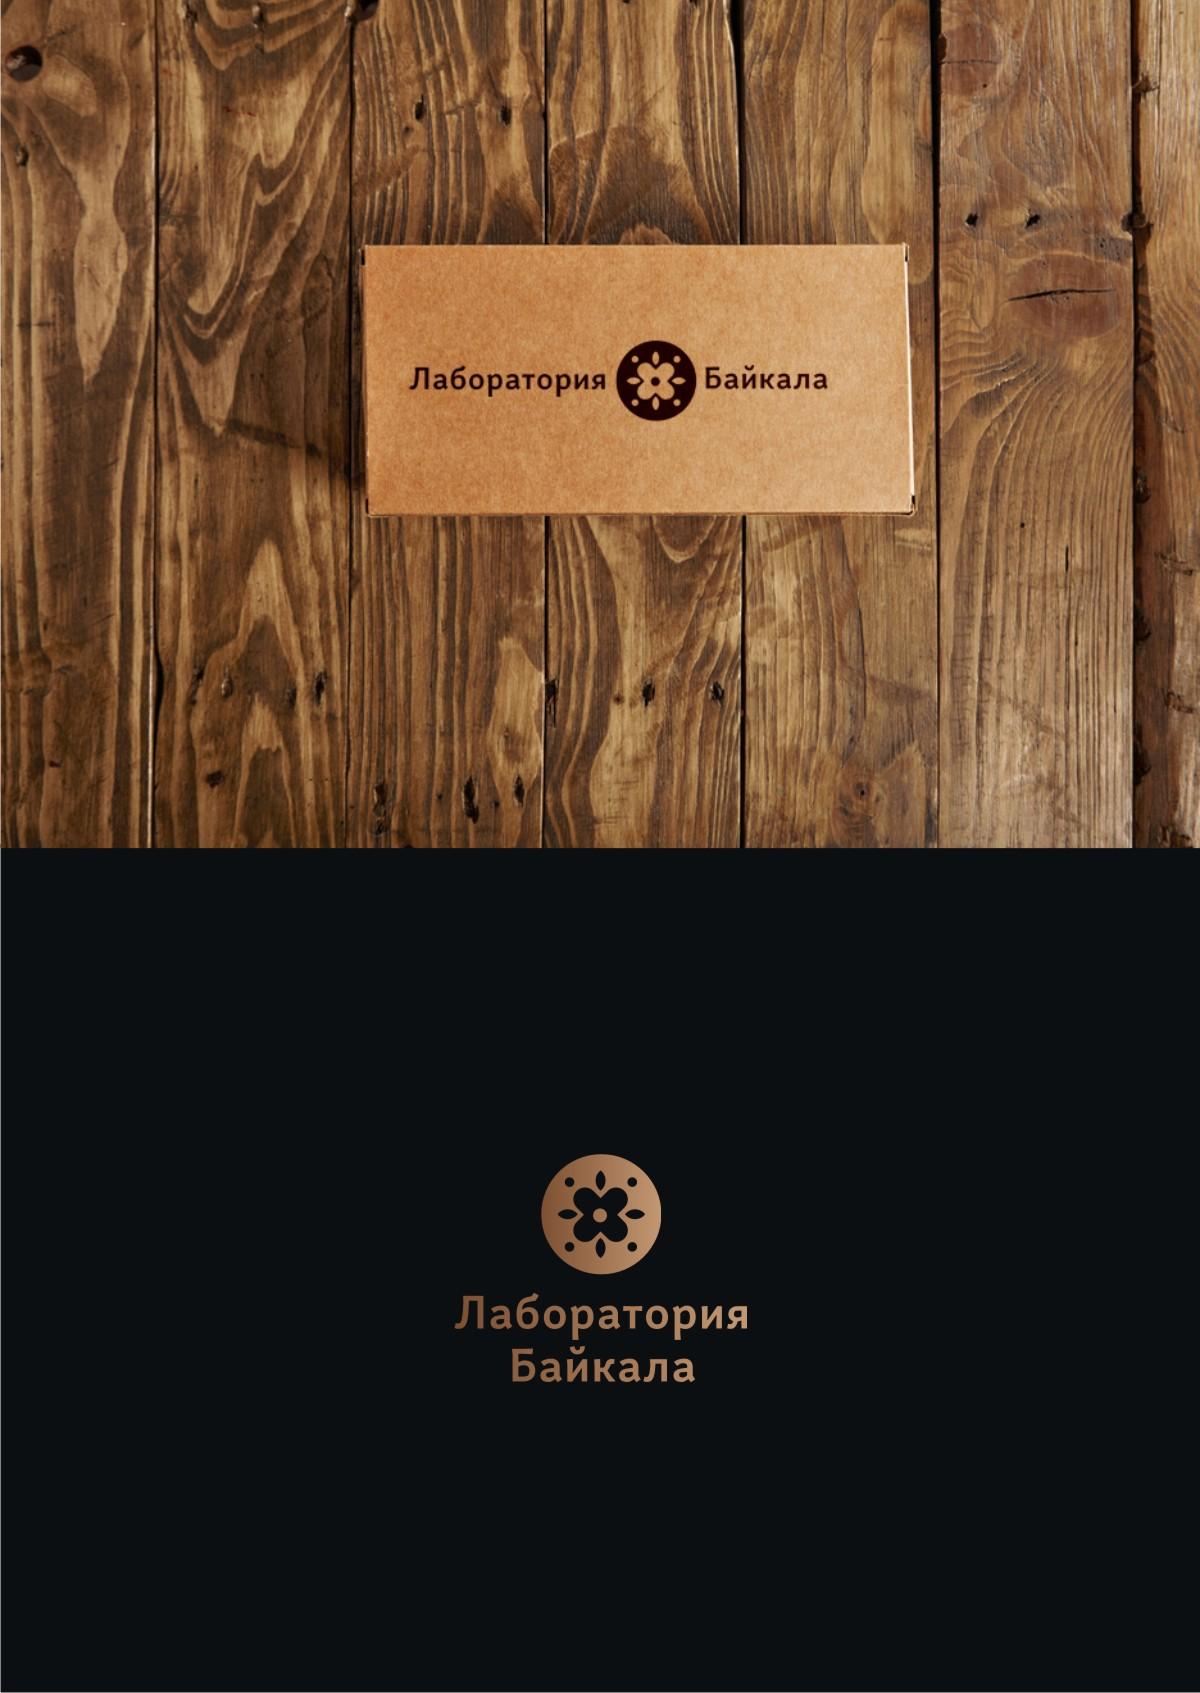 Разработка логотипа торговой марки фото f_727596b11d7c1397.jpg